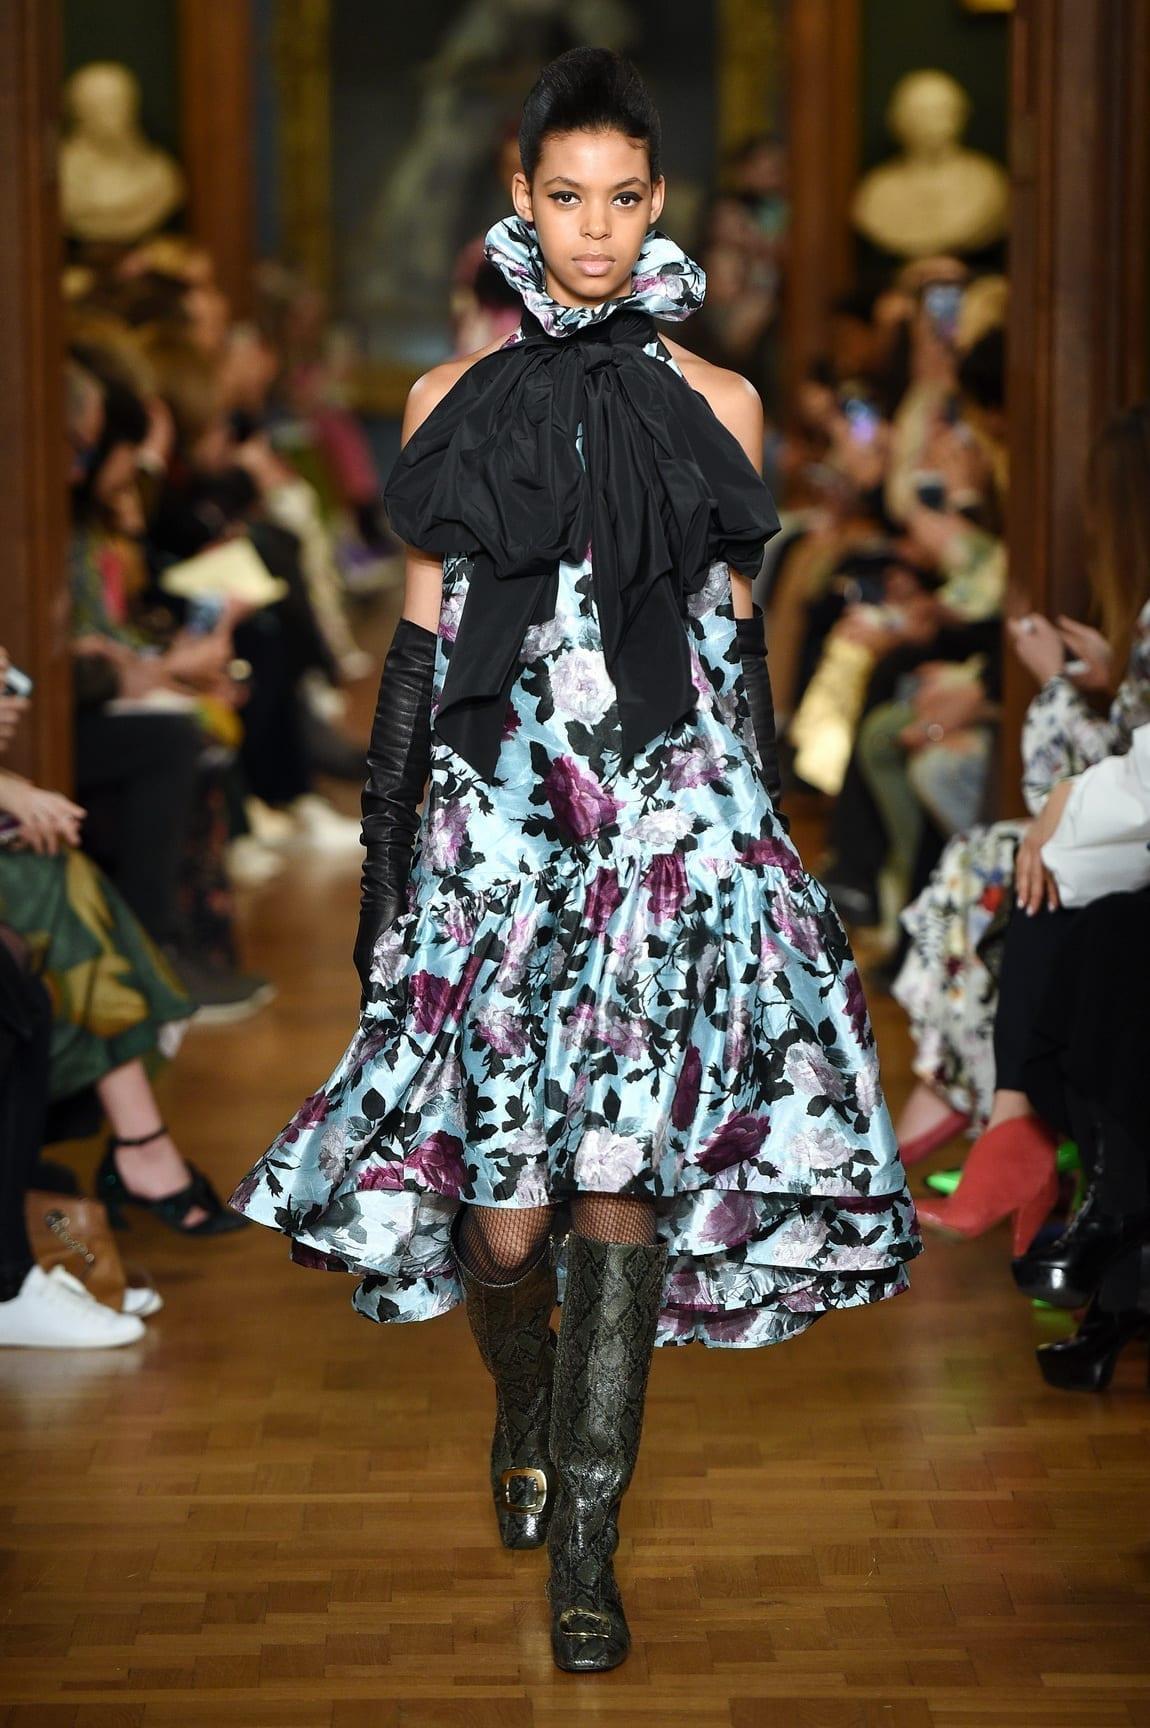 Floral Midi Dresses…Make A Seamless Seasonal Transition